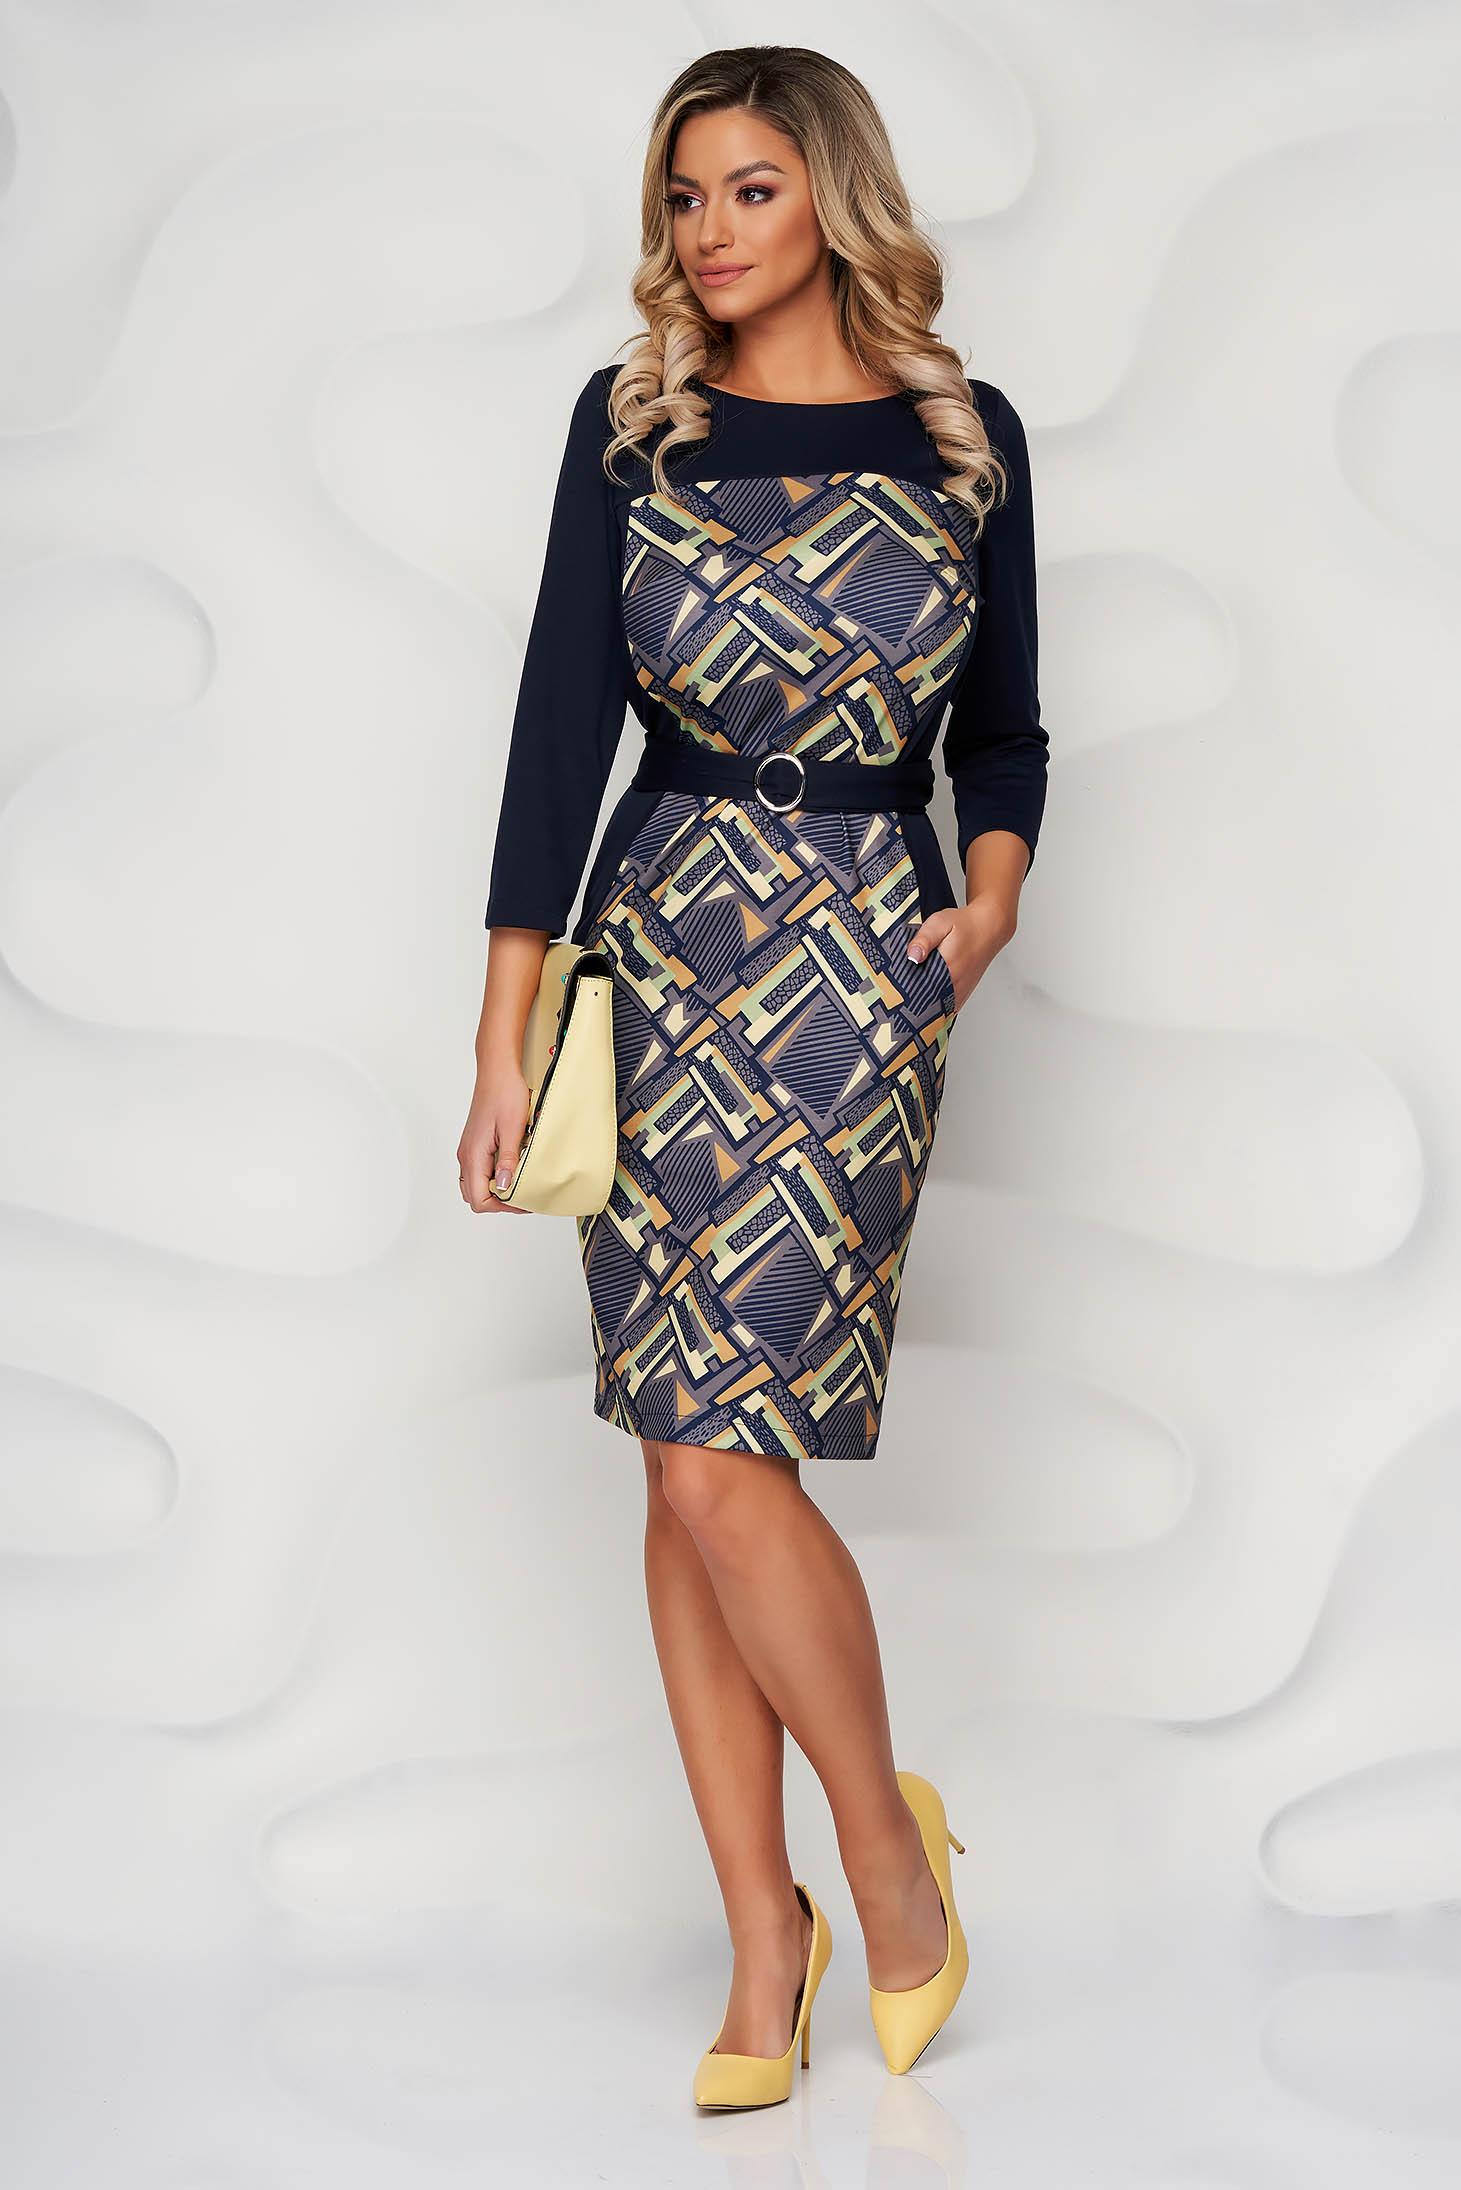 StarShinerS lightgreen dress midi pencil with graphic details slightly elastic fabric